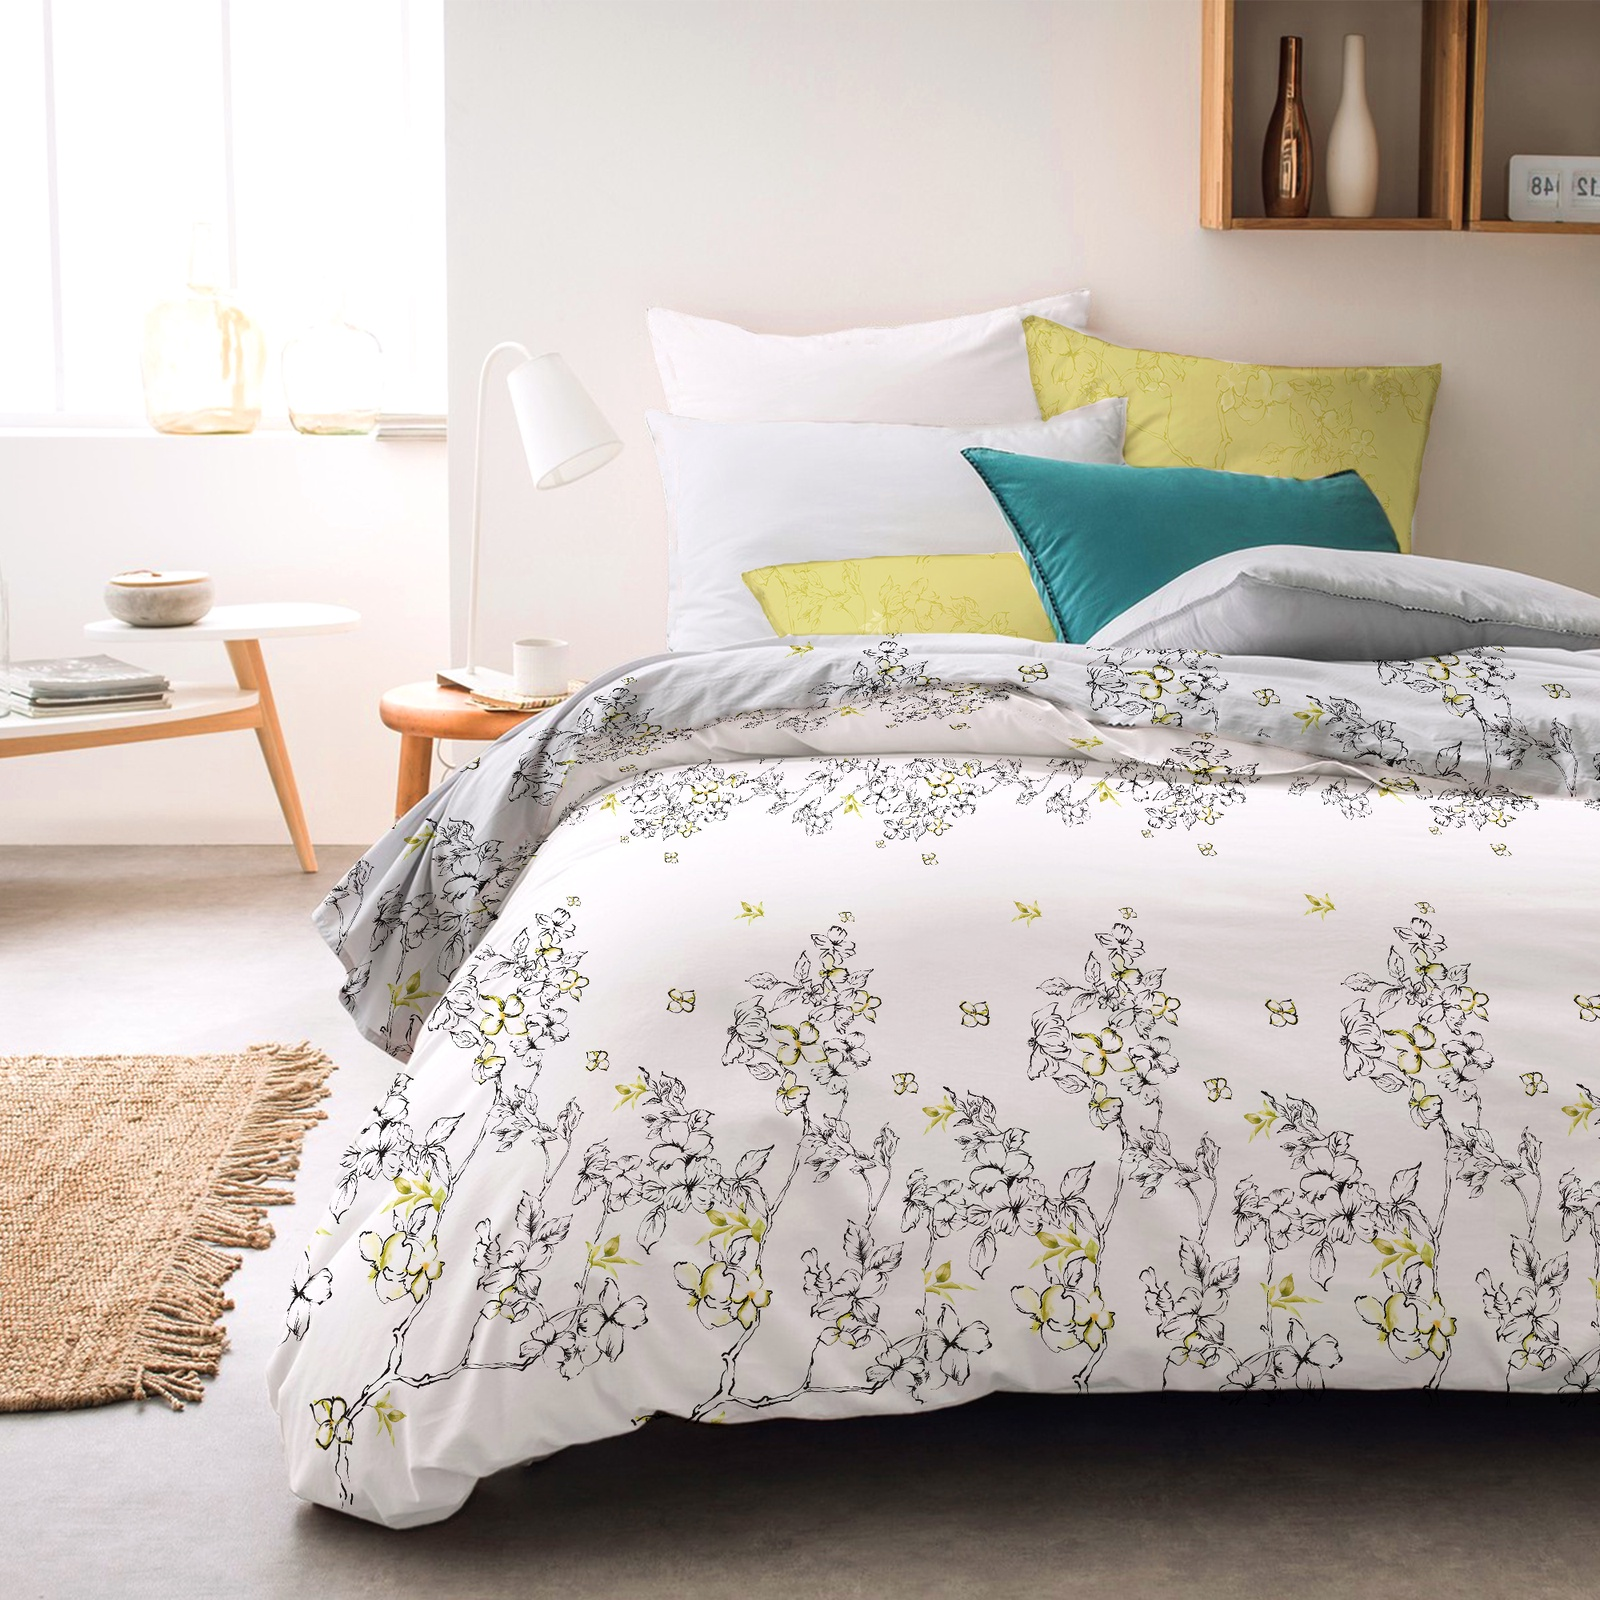 цена Комплект постельного белья Seta Azalea Satin Falena 019132285, евро, наволочки 70x70 см онлайн в 2017 году